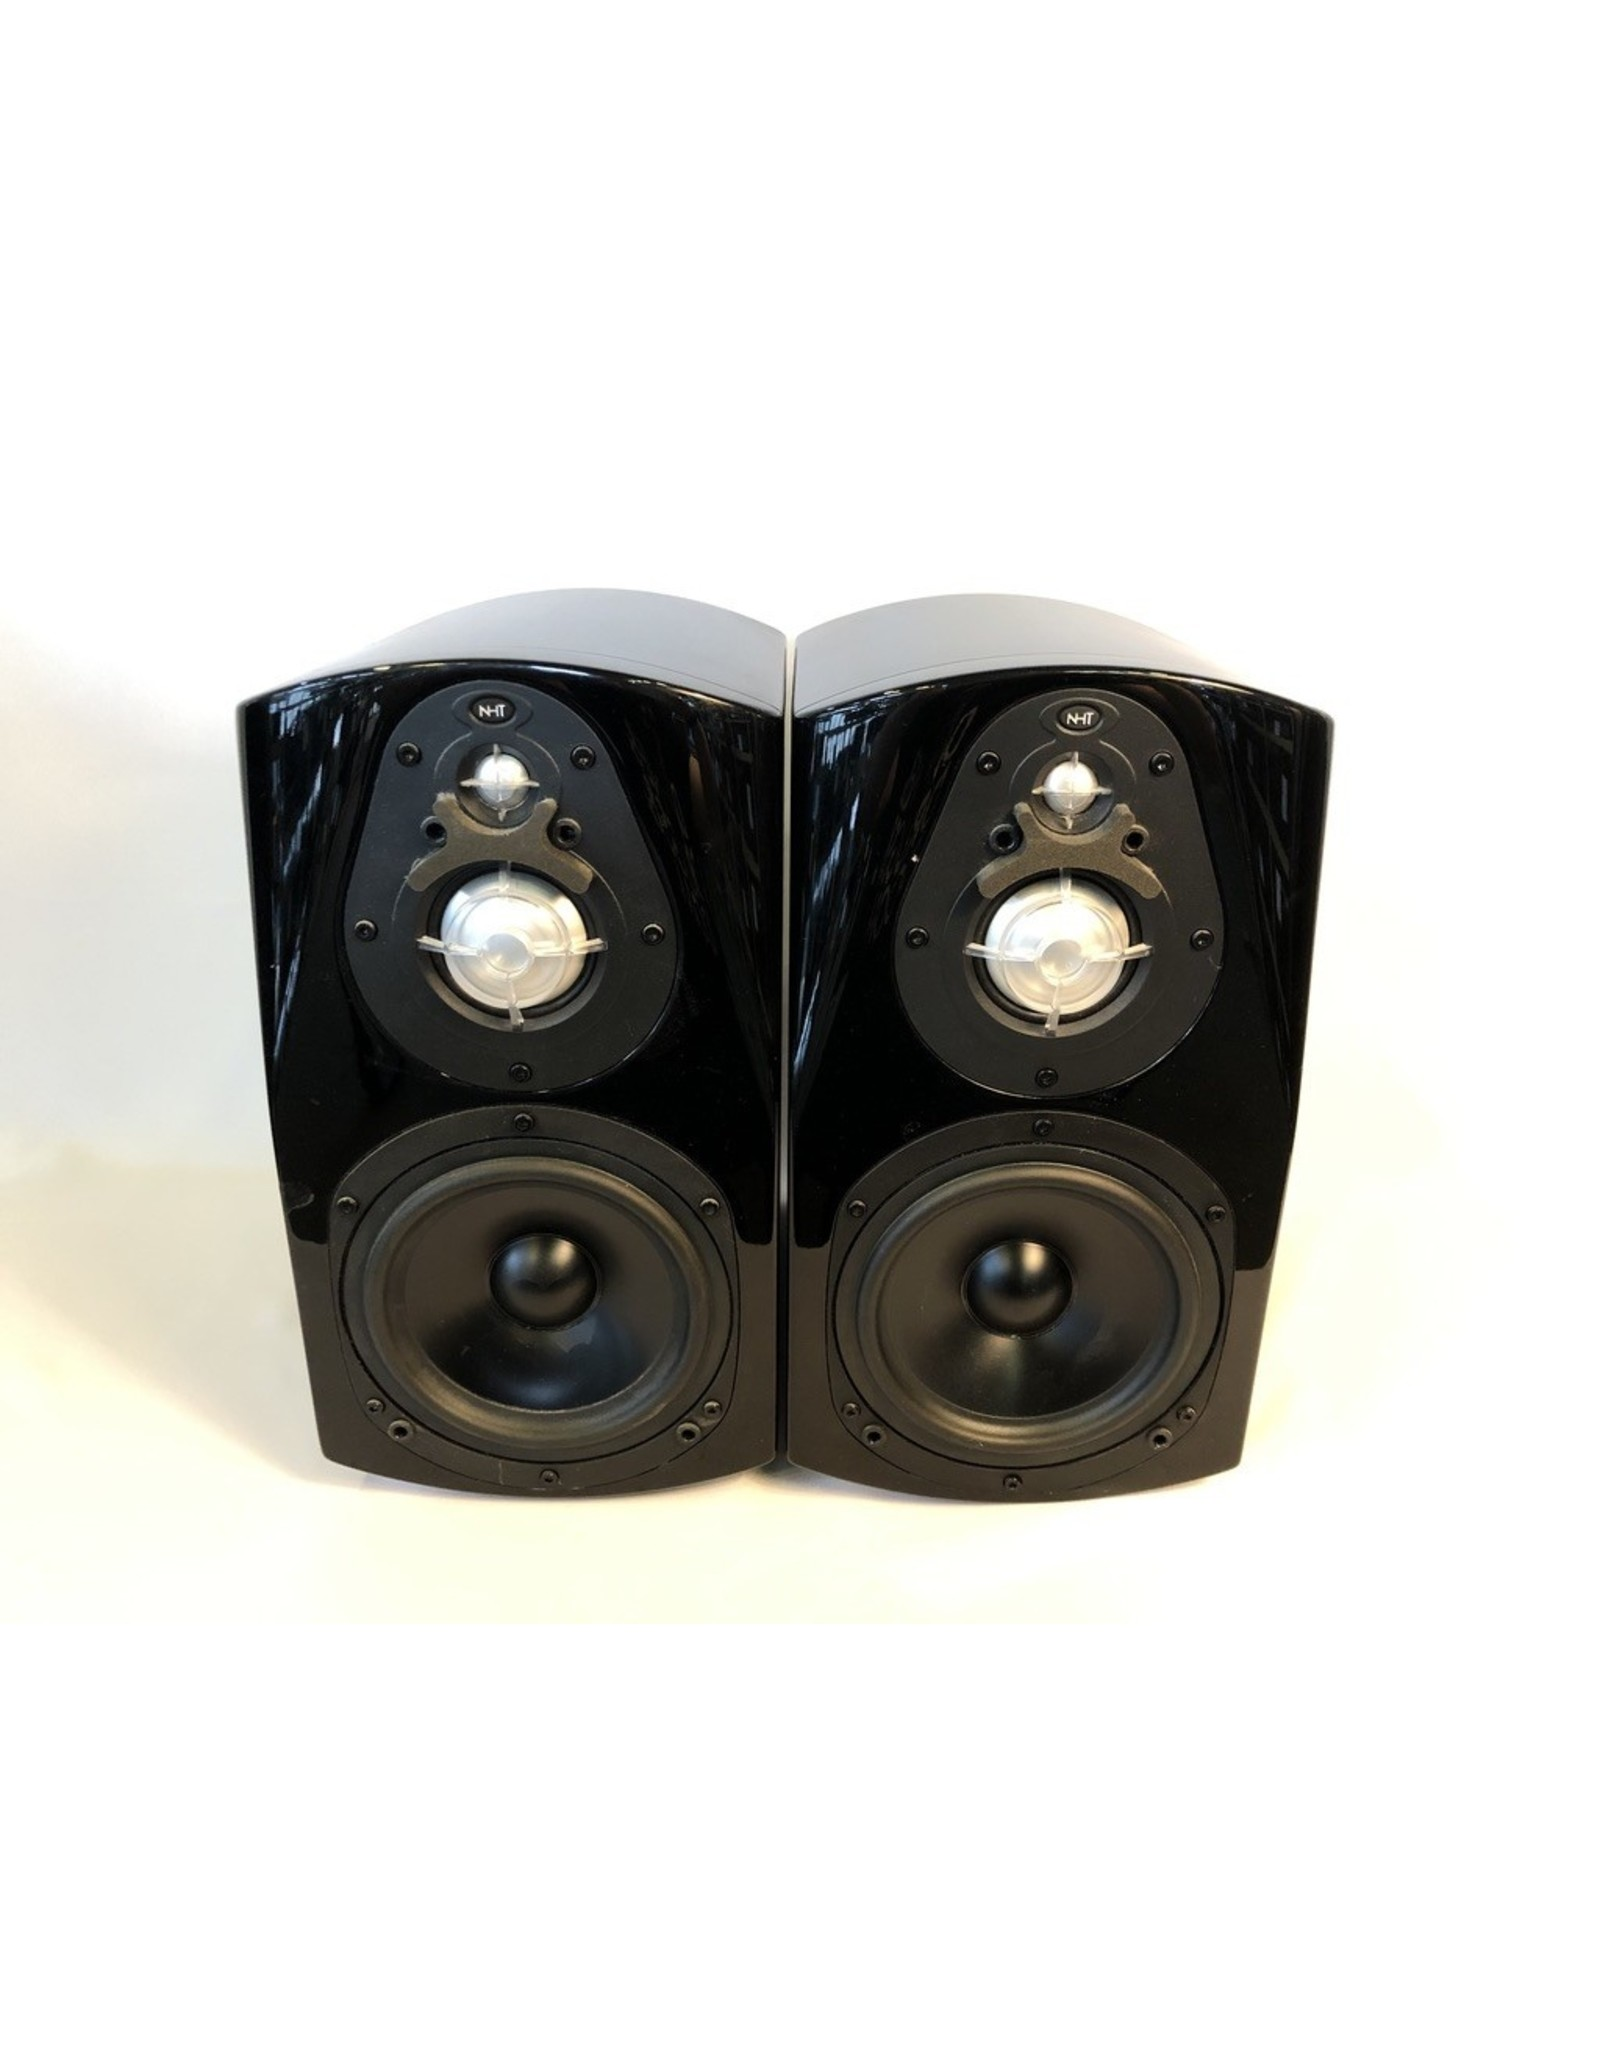 NHT NHT Classic 3 Bookshelf Speakers USED